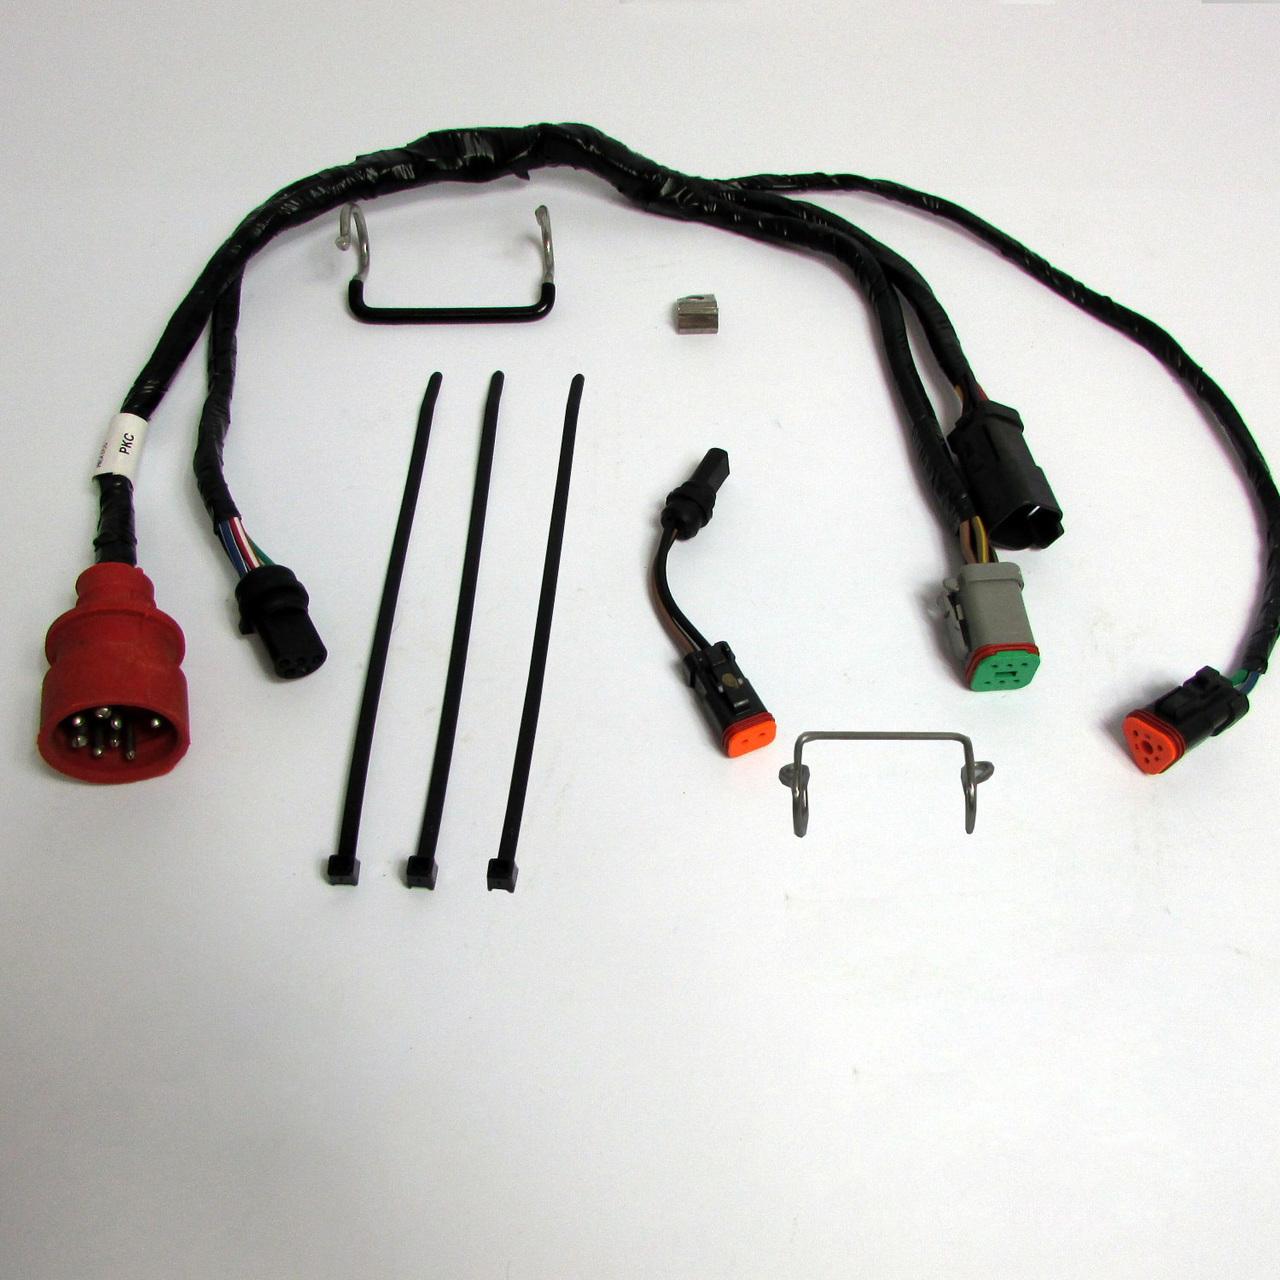 TA_3126] Evinrude Wiring Harness Connectors Free DiagramHone Puti Ixtu Nowa Orsal Emba Mohammedshrine Librar Wiring 101